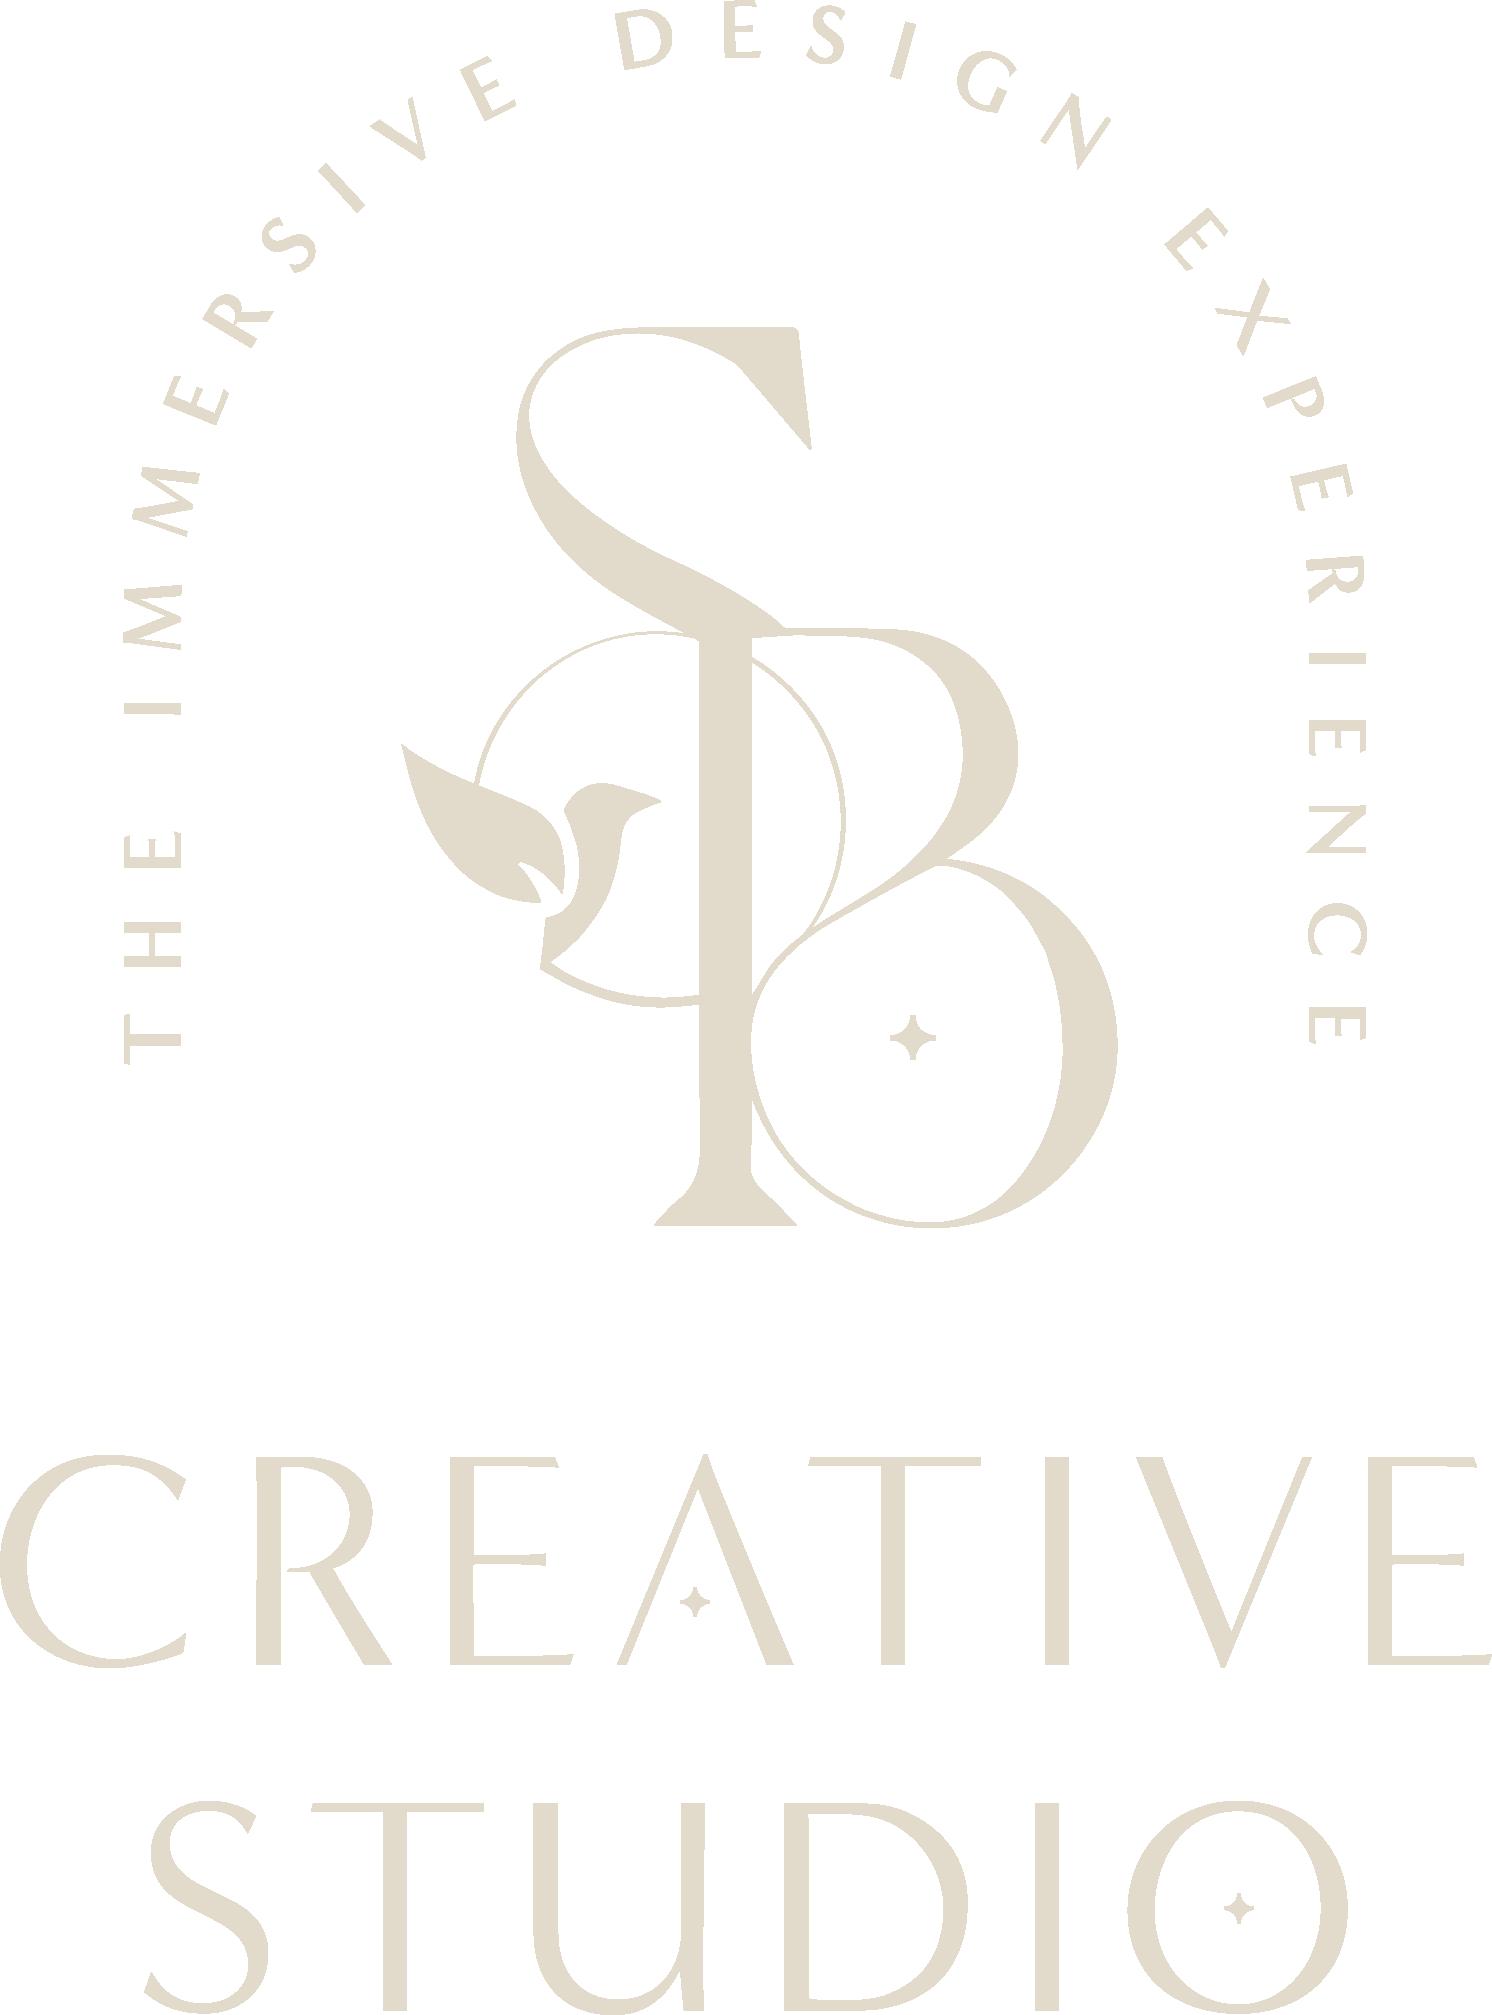 SB Creative Studio